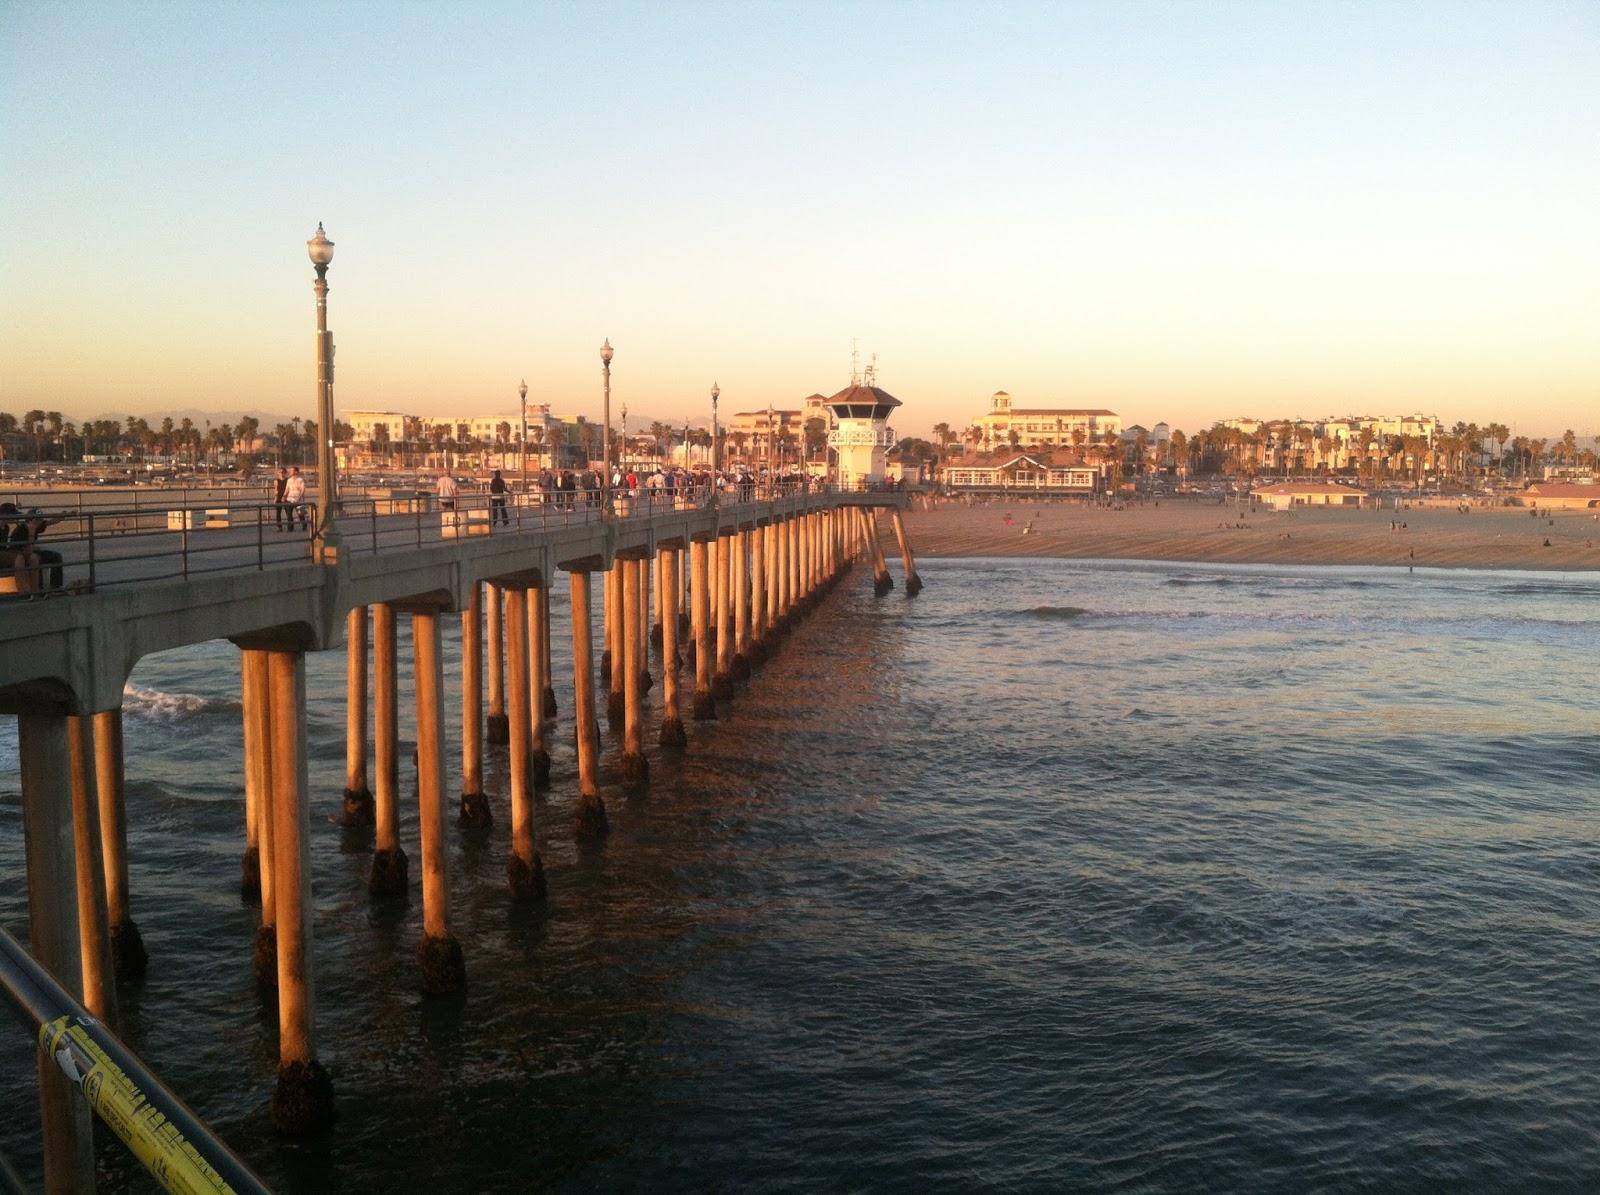 Genea musings on the huntington beach pier post 474 for Huntington beach pier fishing